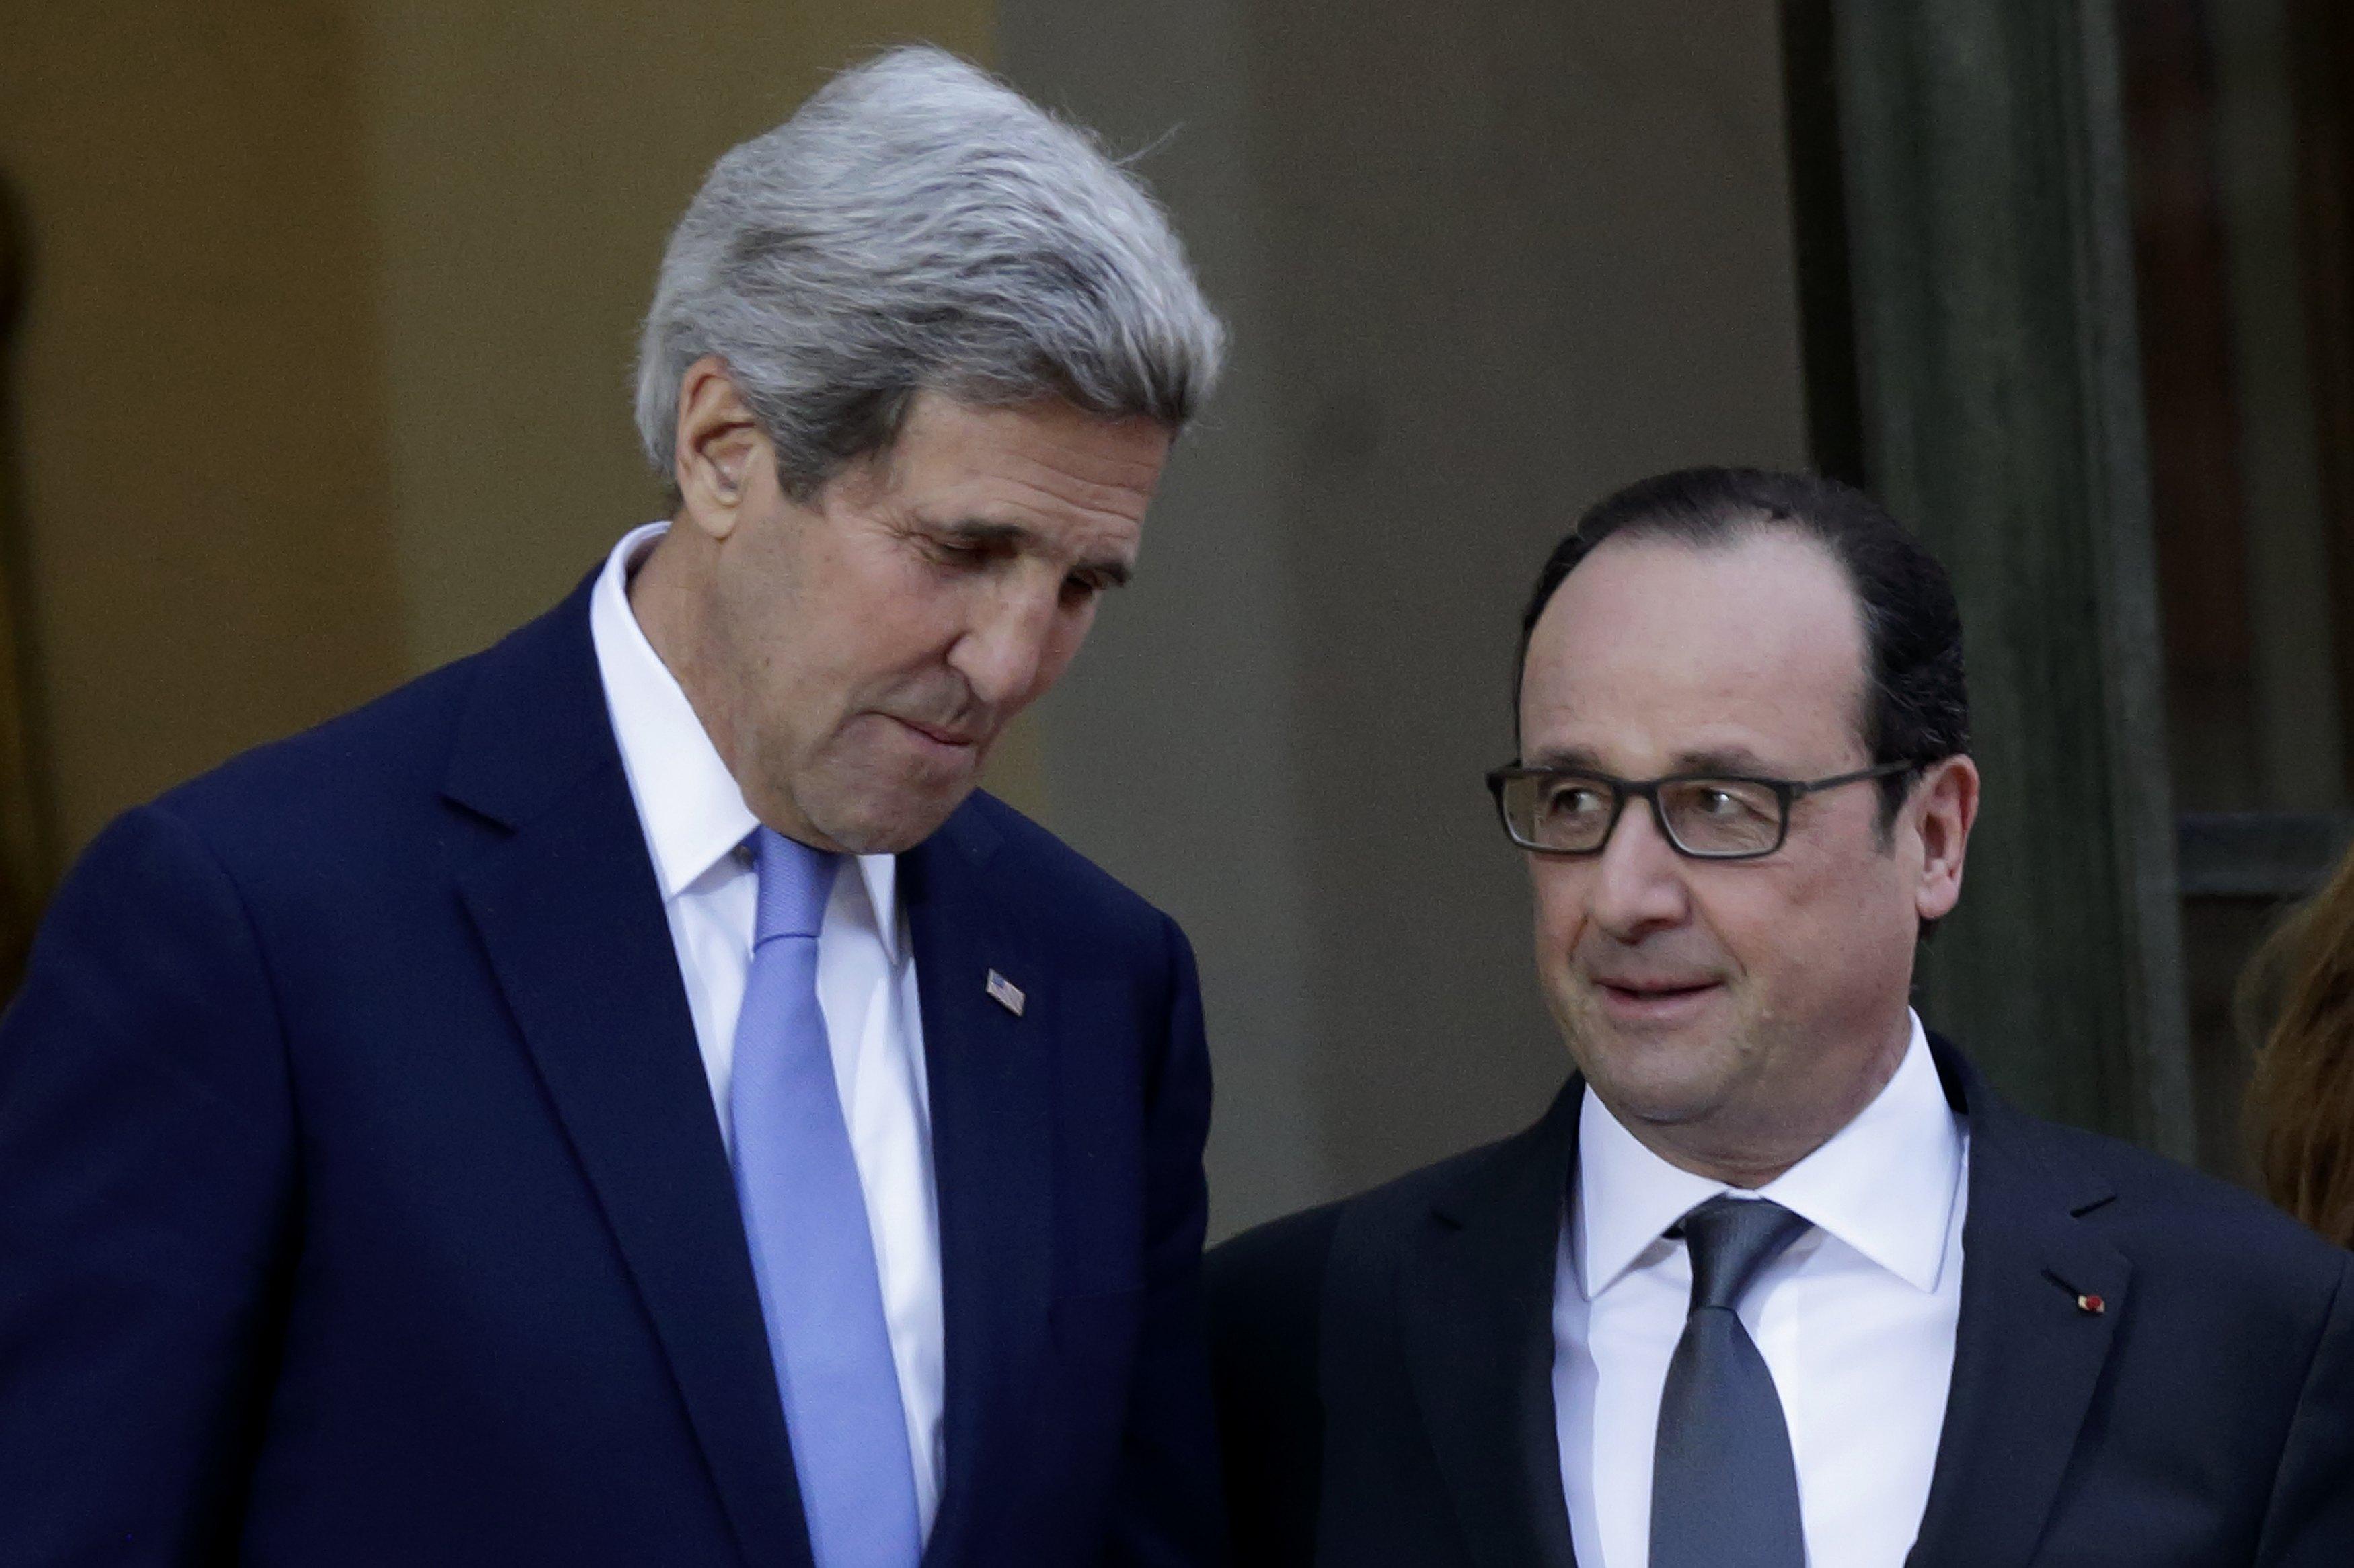 Paris police arrest 12 linked to shootings as US' Kerry arrives